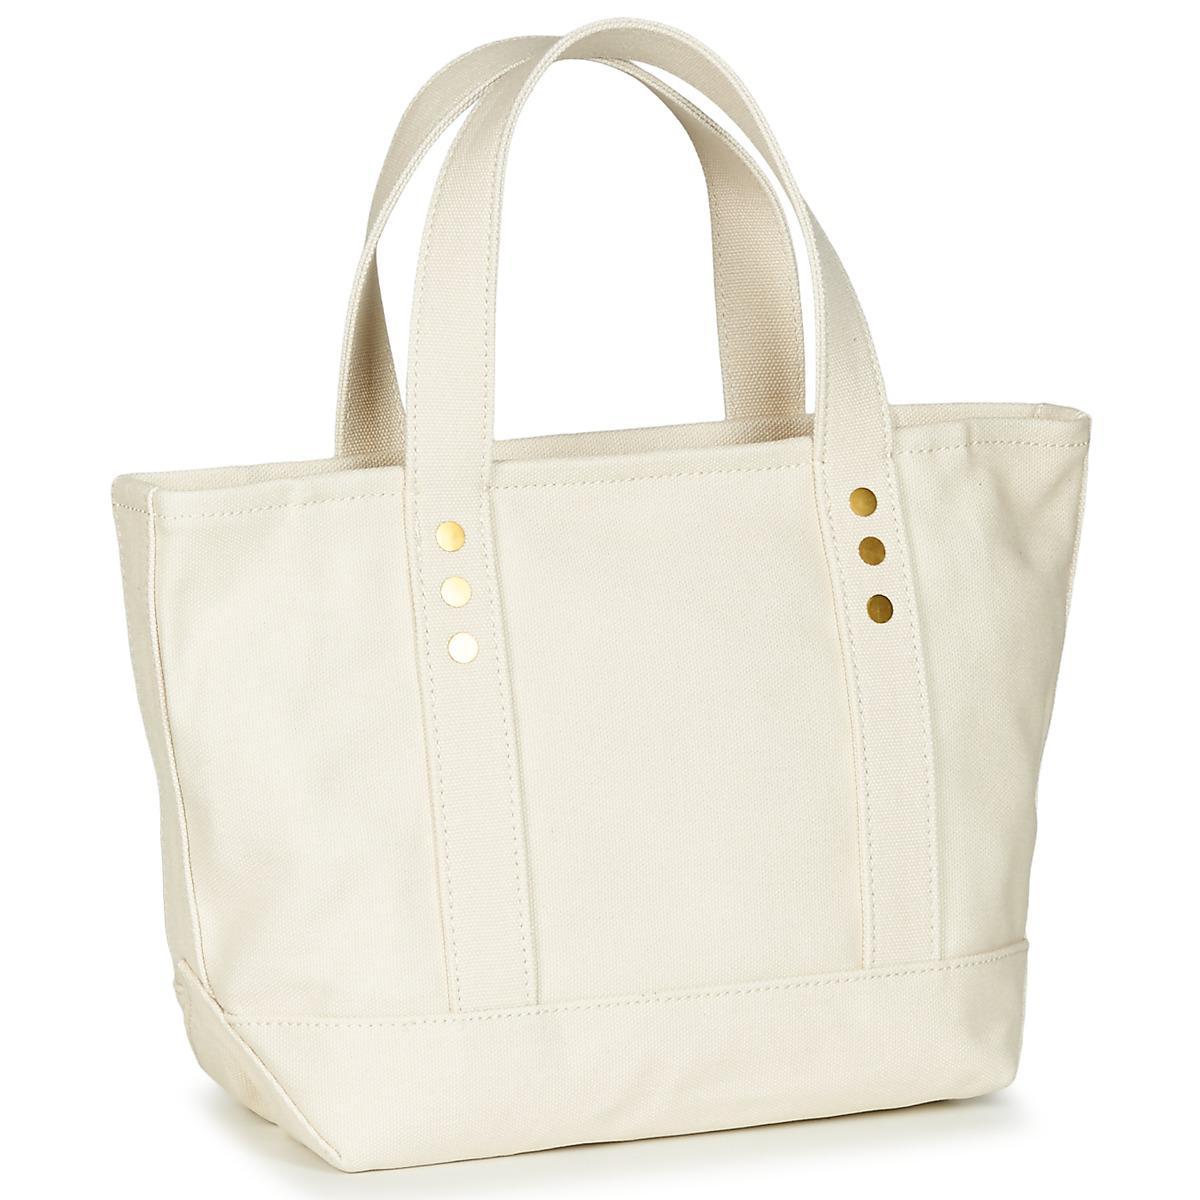 d33dcff151 Polo Ralph Lauren - Md Clsc Tote Women s Shopper Bag In White for Men -  Lyst. View fullscreen